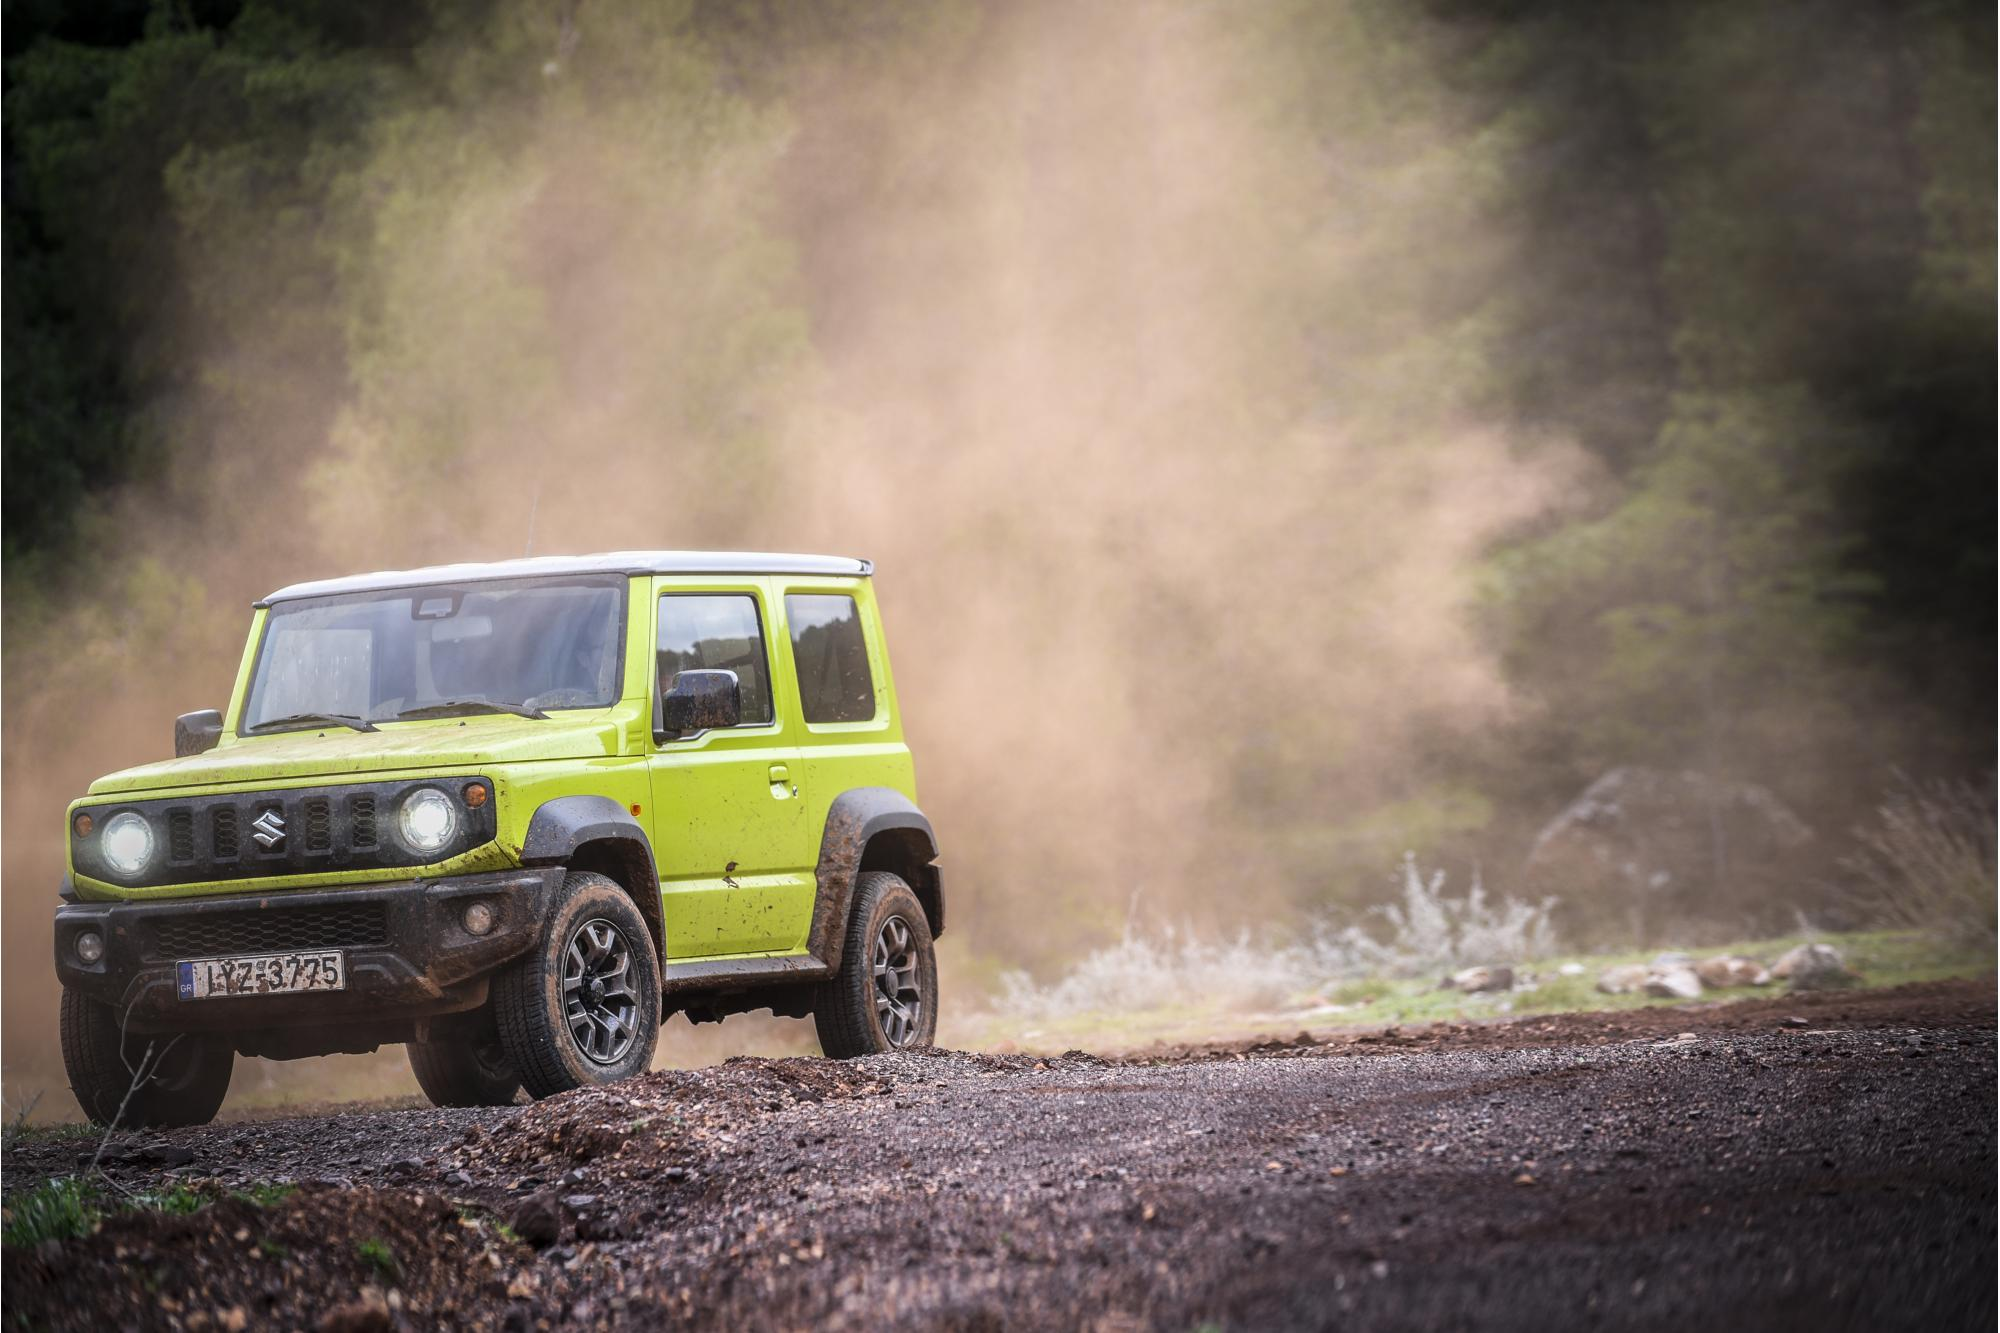 Suzuki Jimny 1.5 GLX 4WD AllGrip 105Ps